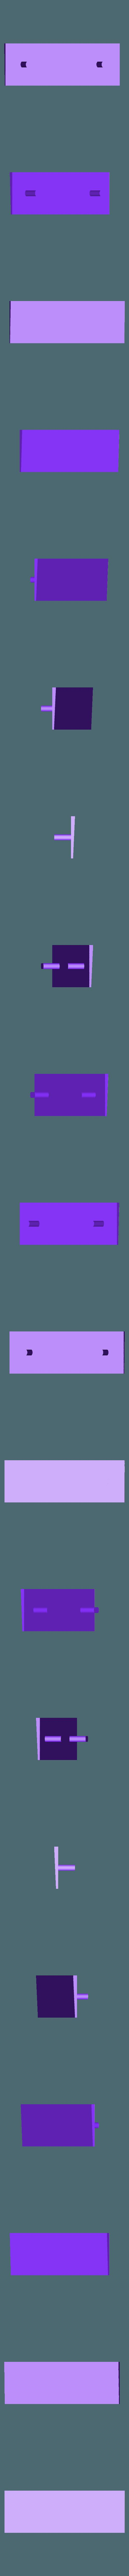 supp av chero scx.stl Download free STL file Body opening SCX10/INJORA/AUSTAR • 3D printable object, RCGANG93